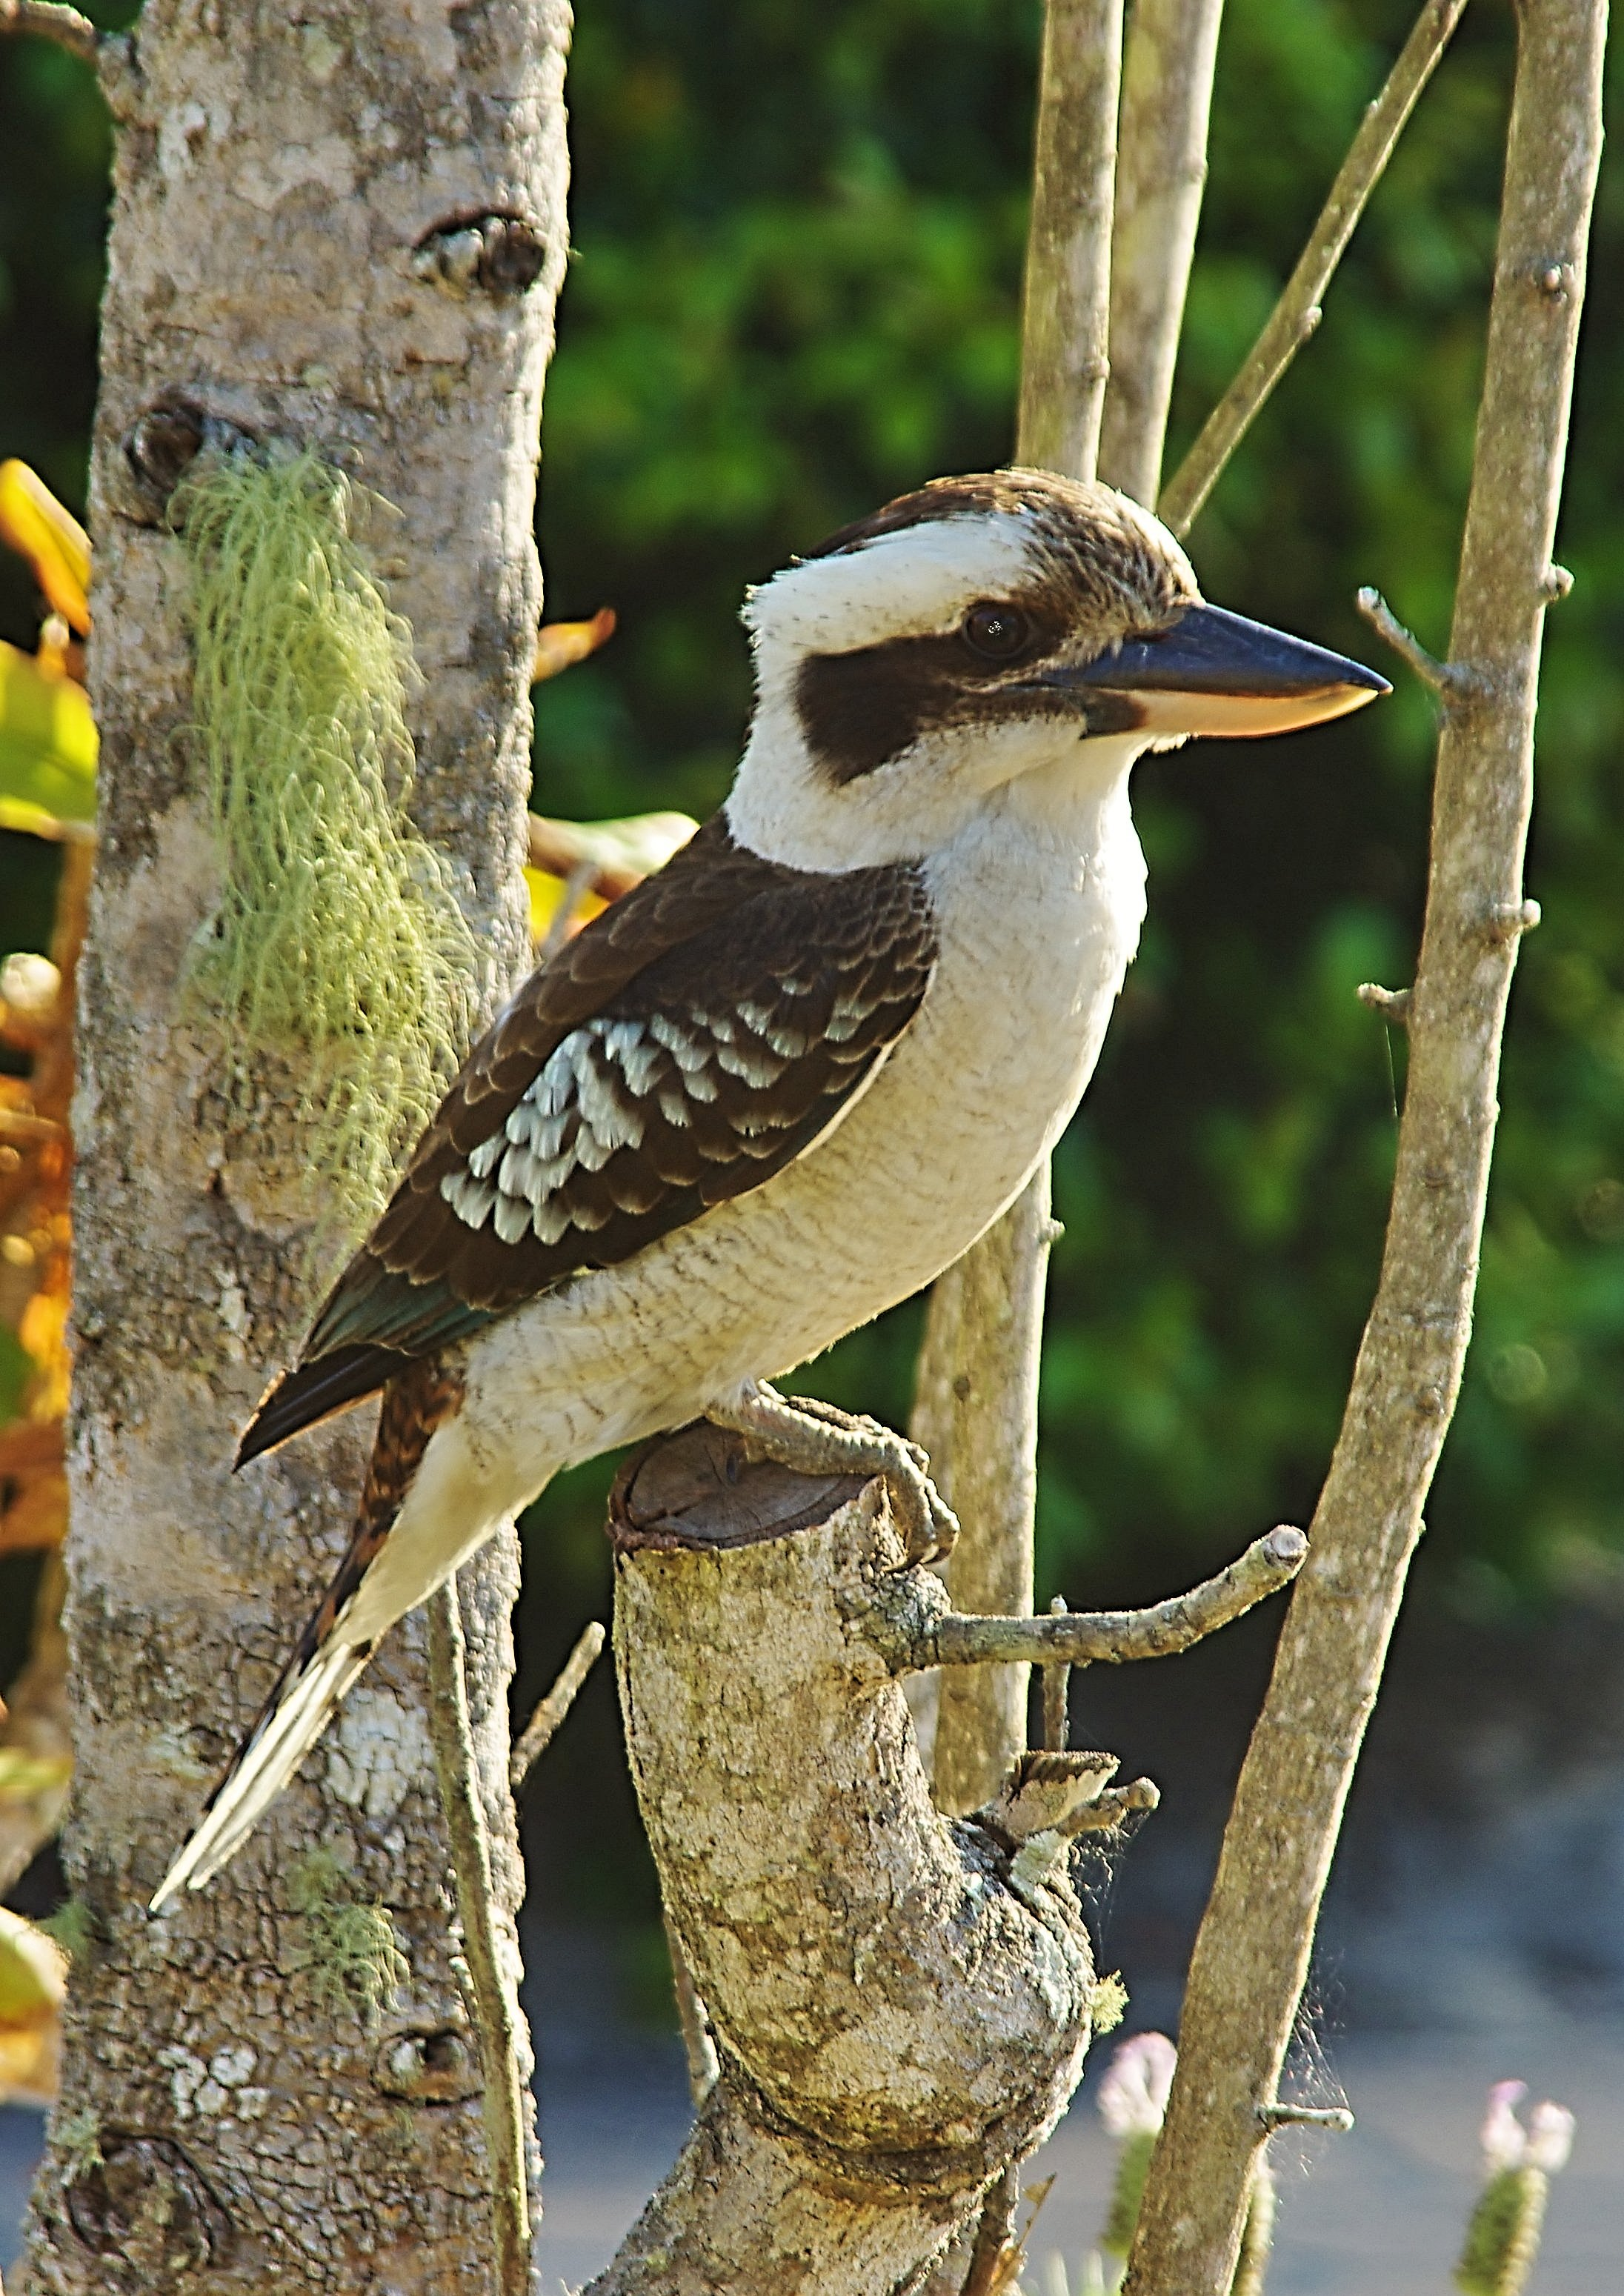 Southern Kookaburra